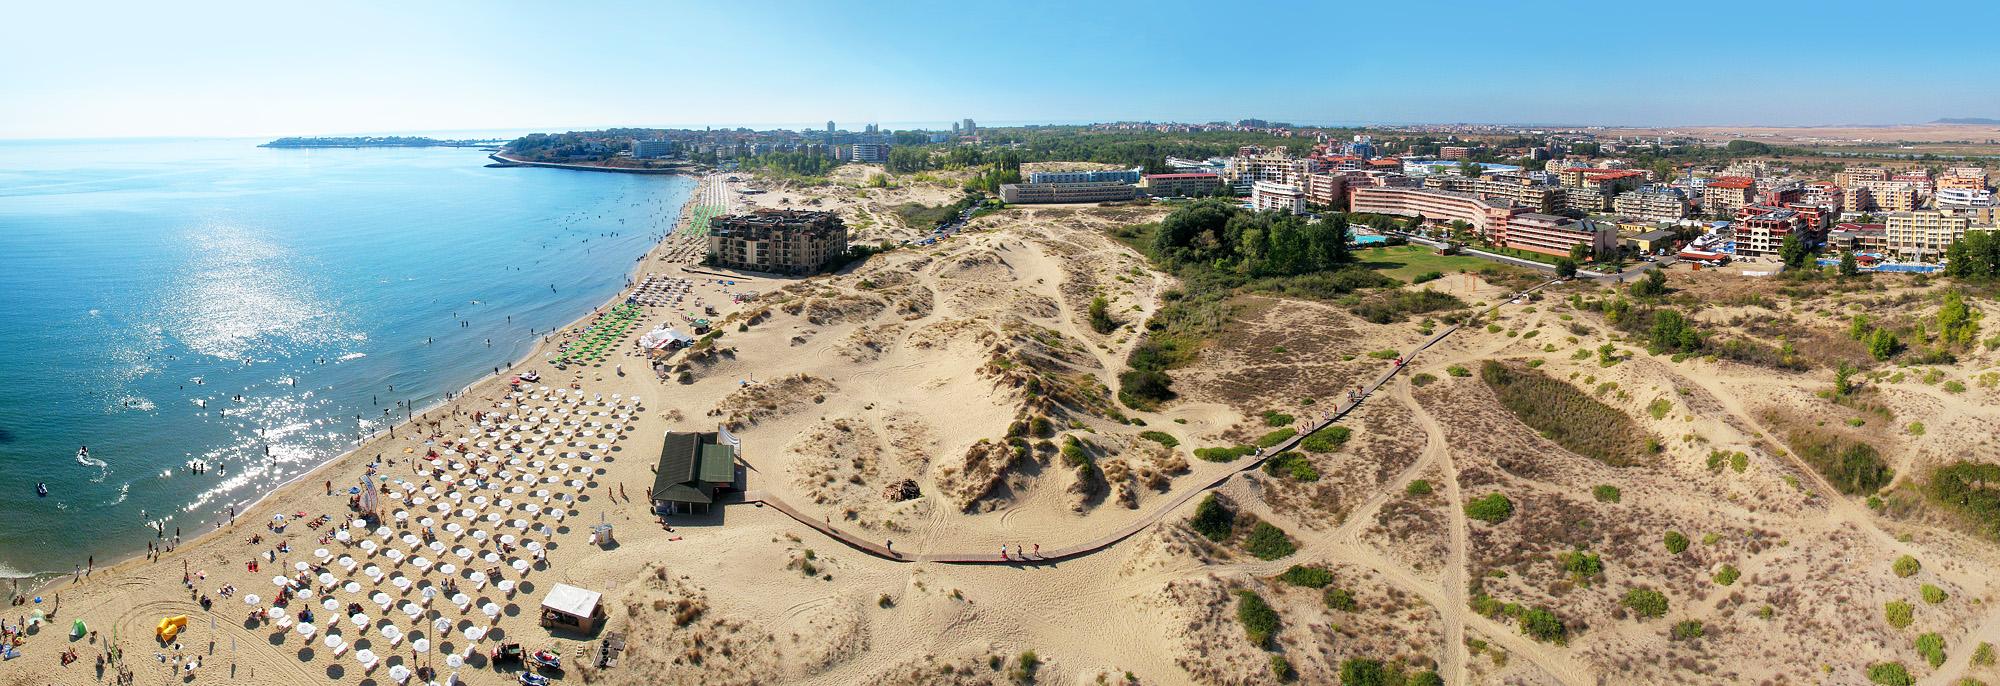 Hotel Burgas Beach Bulgarien Sonnenstrand